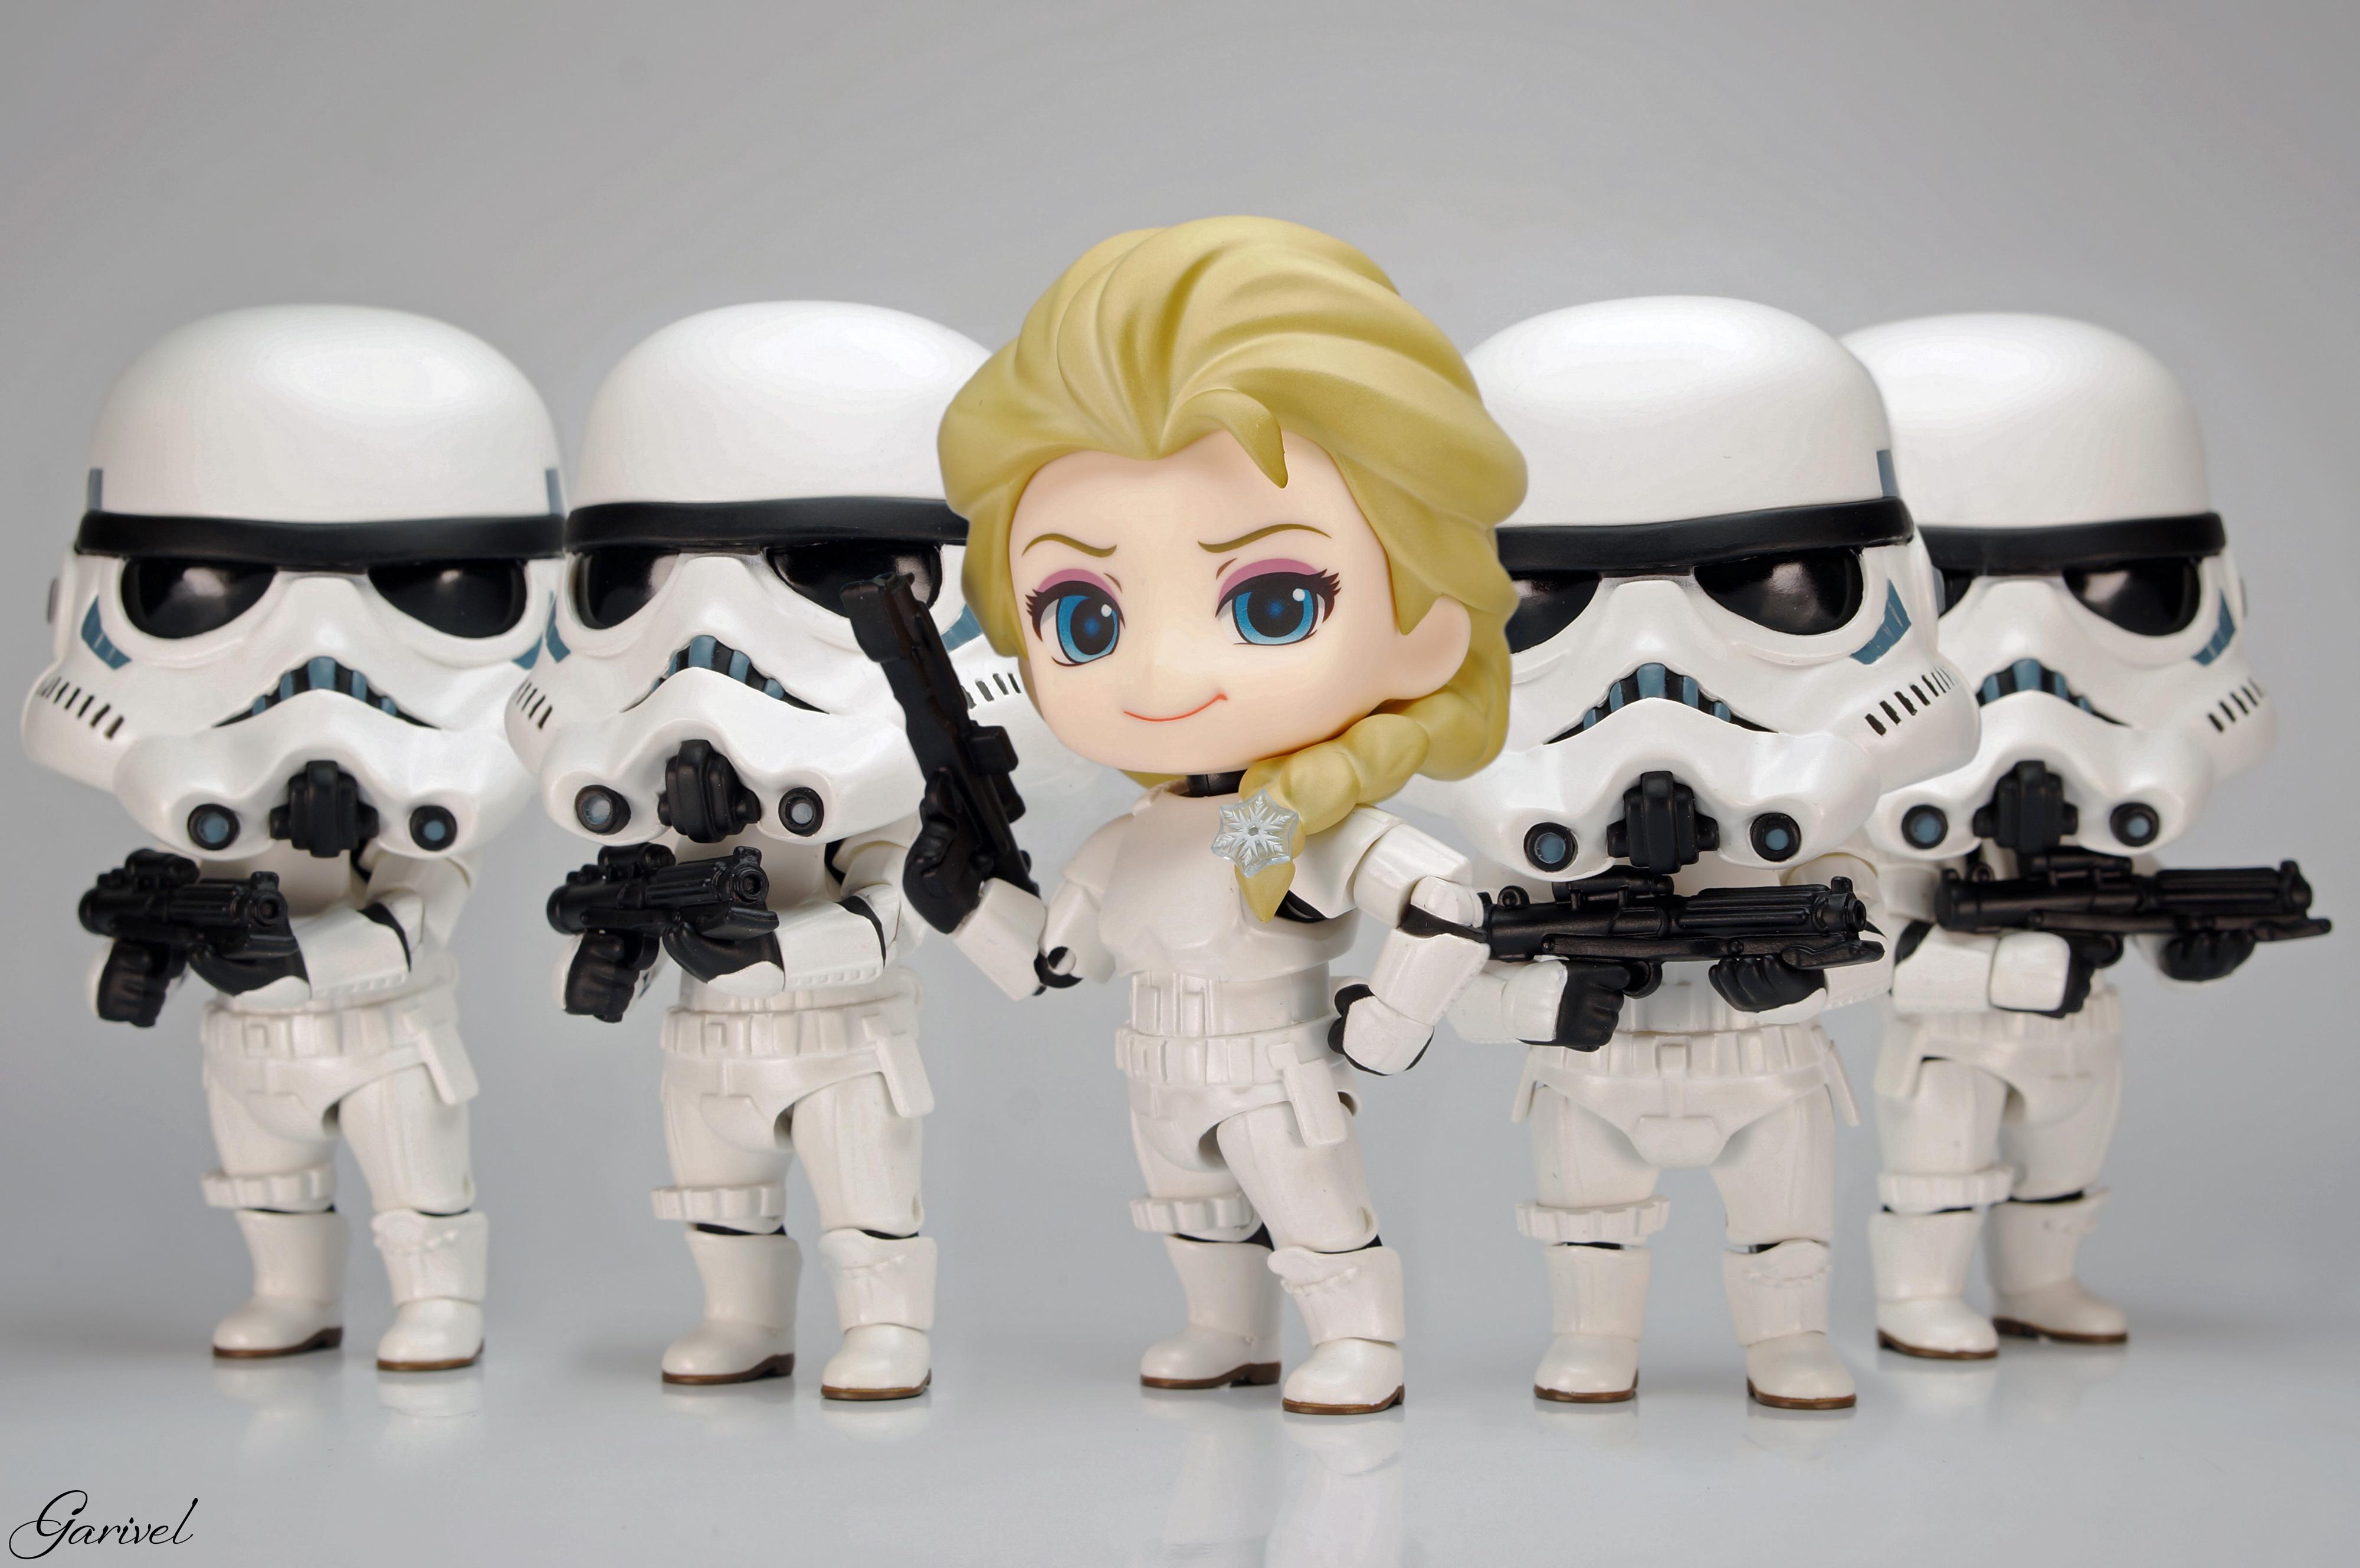 nendoroid good_smile_company star_wars frozen stormtrooper nendoron the_walt_disney_company lucasfilm elsa matsumura_engineering katahara_itashi olaf